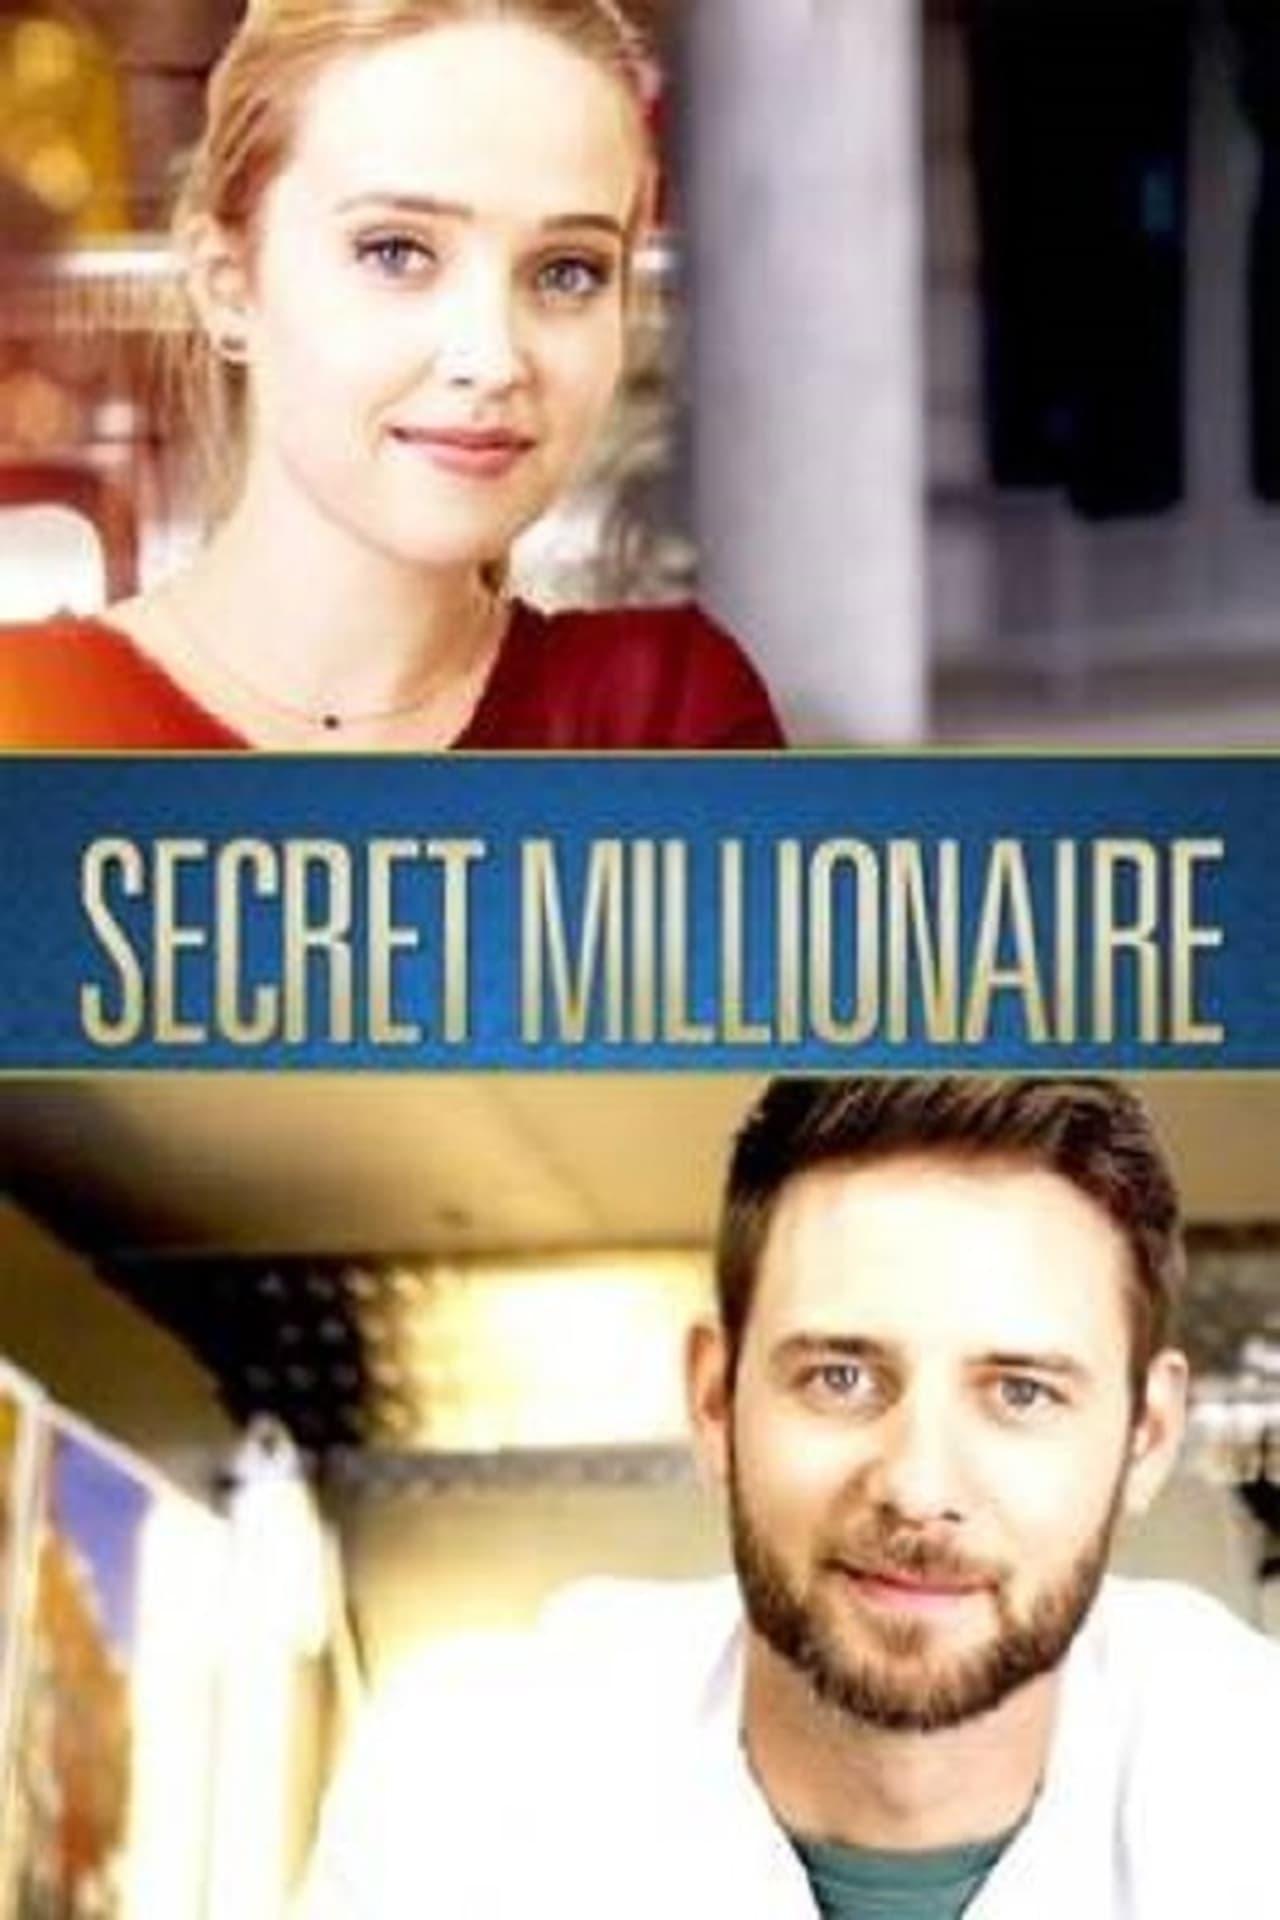 Watch Streaming Secret Millionaire (2018) Movie Trailer at youtube.bestmoviehd.net